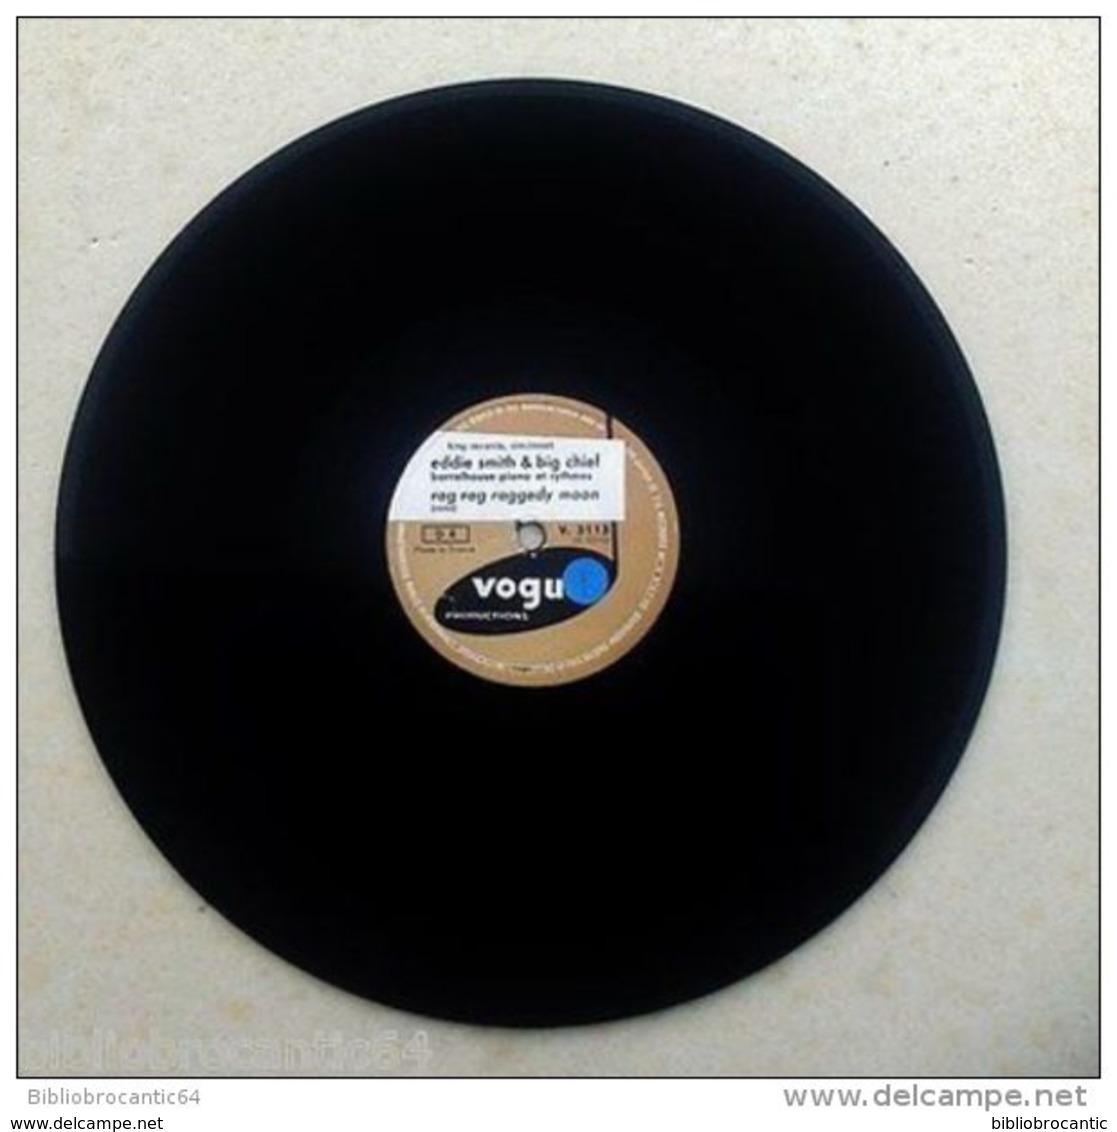 "78 Tours "" EDDIE SMITH & BIG CHIEF ""RAGTIME MELODY // RAG RAG RAGGEDY MOON < VOGUE V.3113 - 78 T - Disques Pour Gramophone"